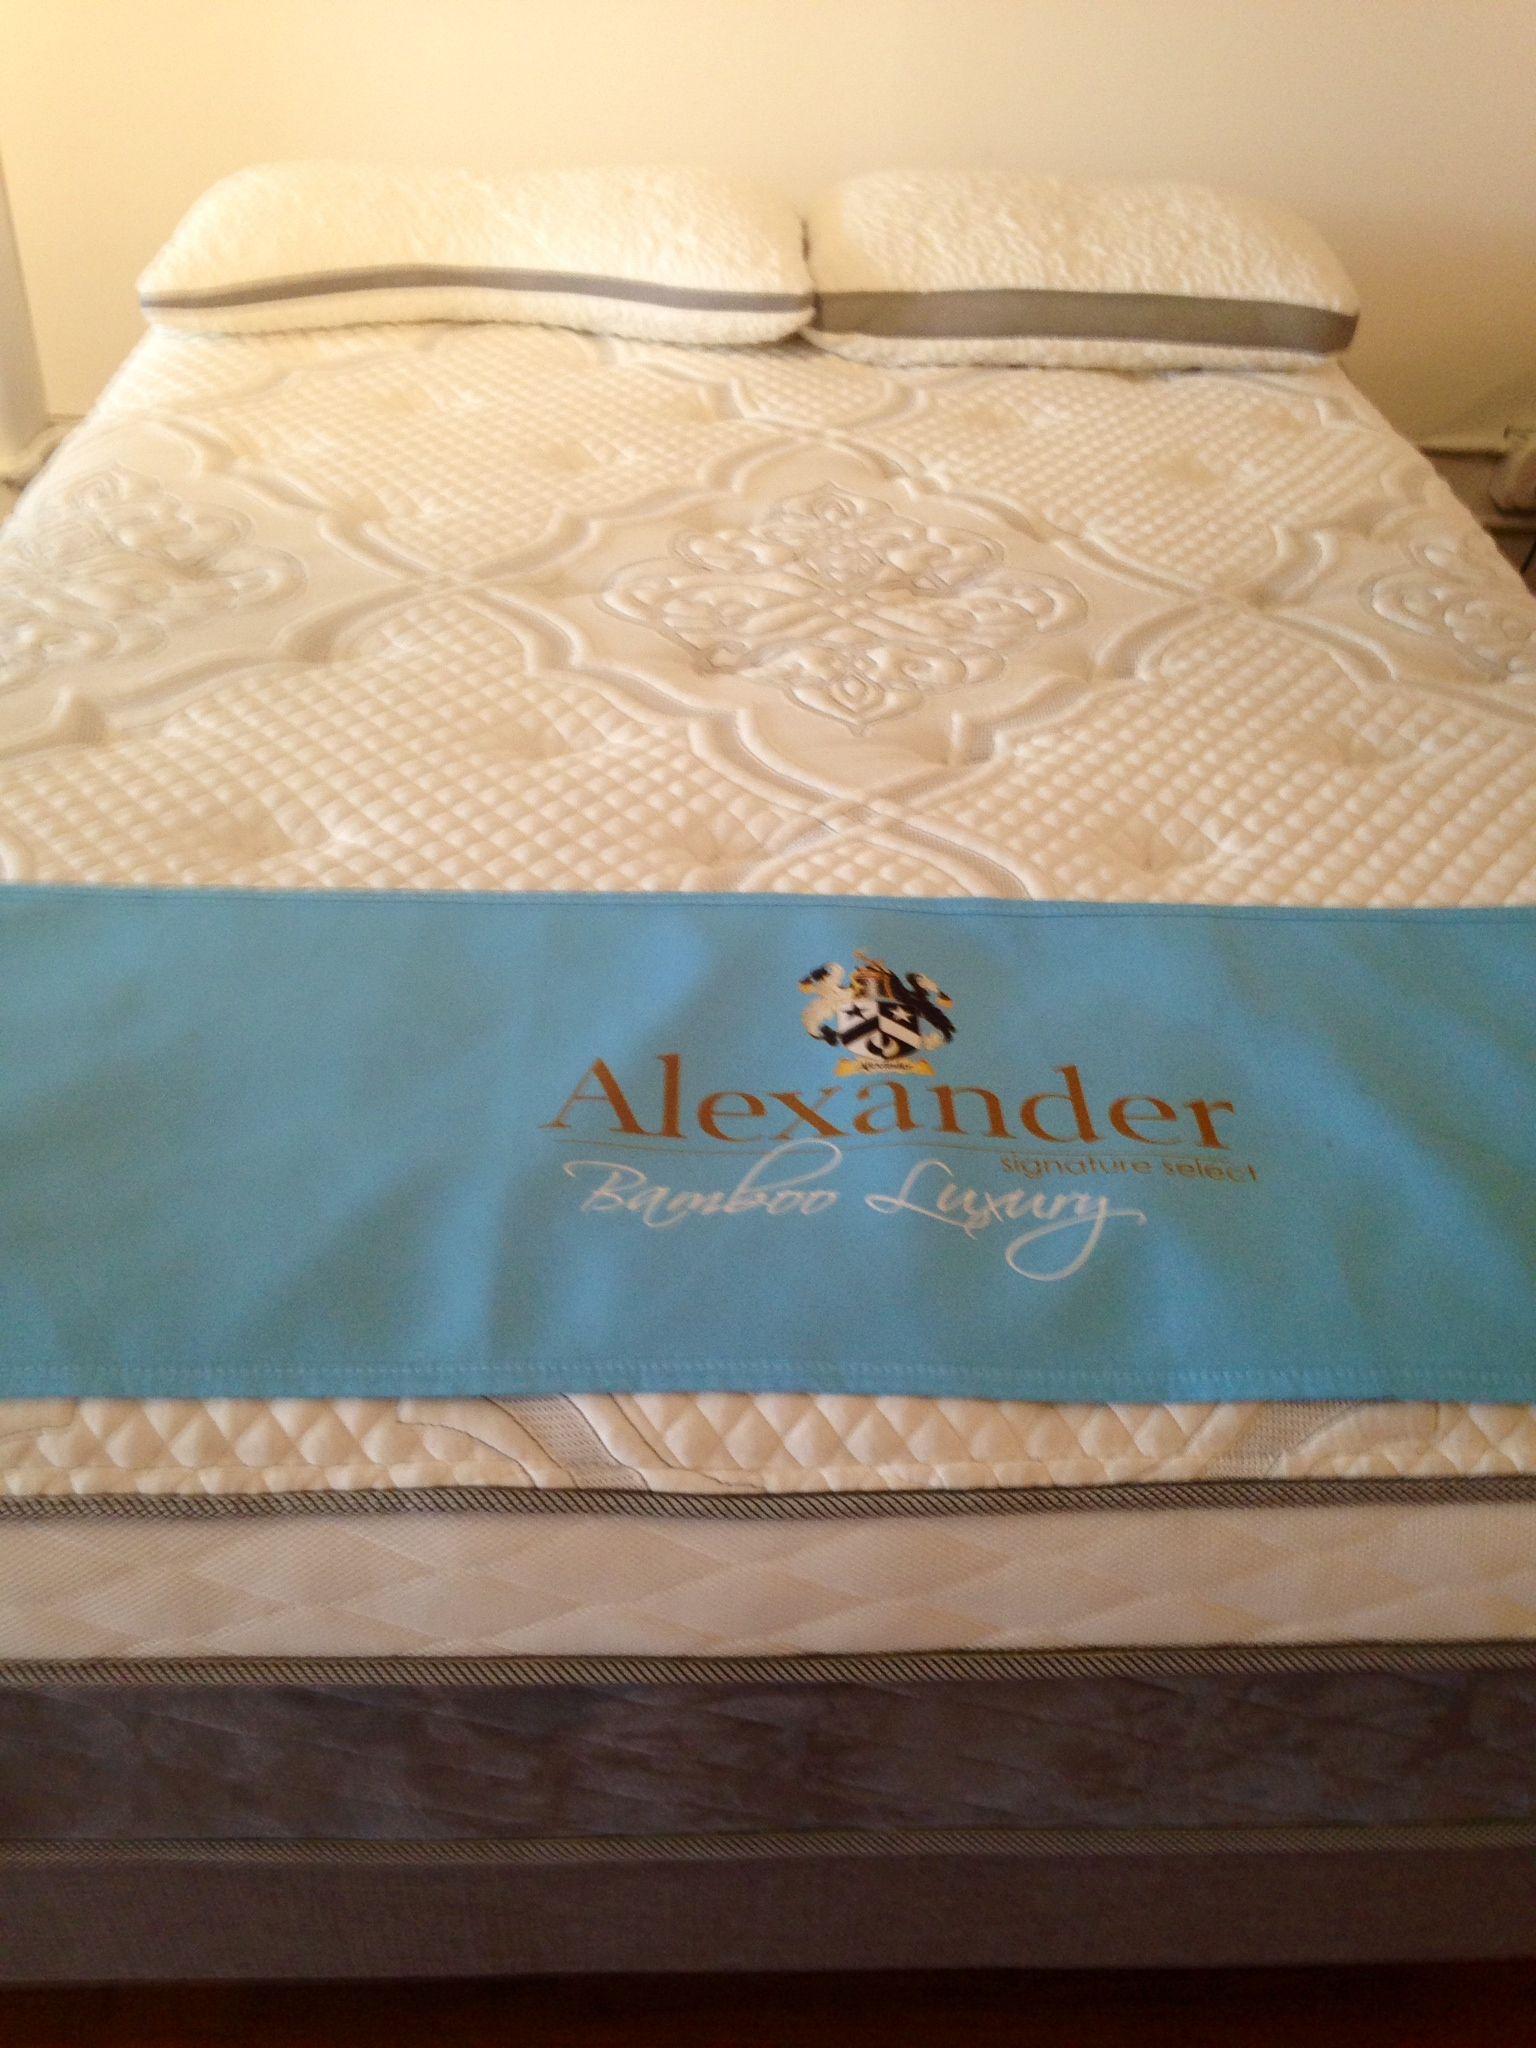 Alexander signature mattress review 2020 1 trusted